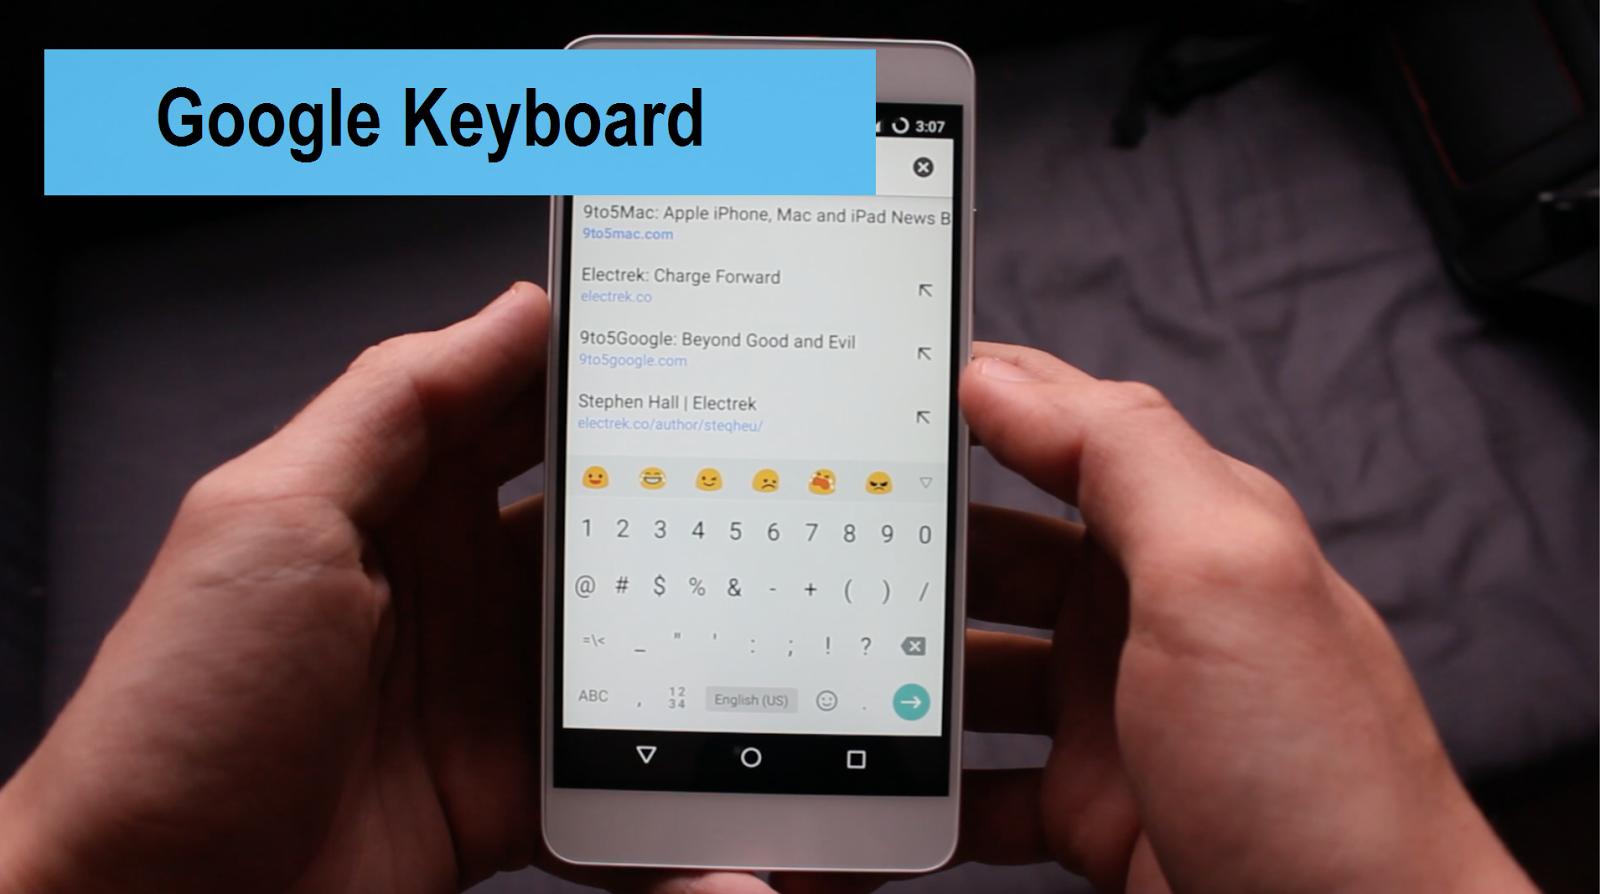 Cara mudah memasang emoji emoticon gratis dari Google Keyboard